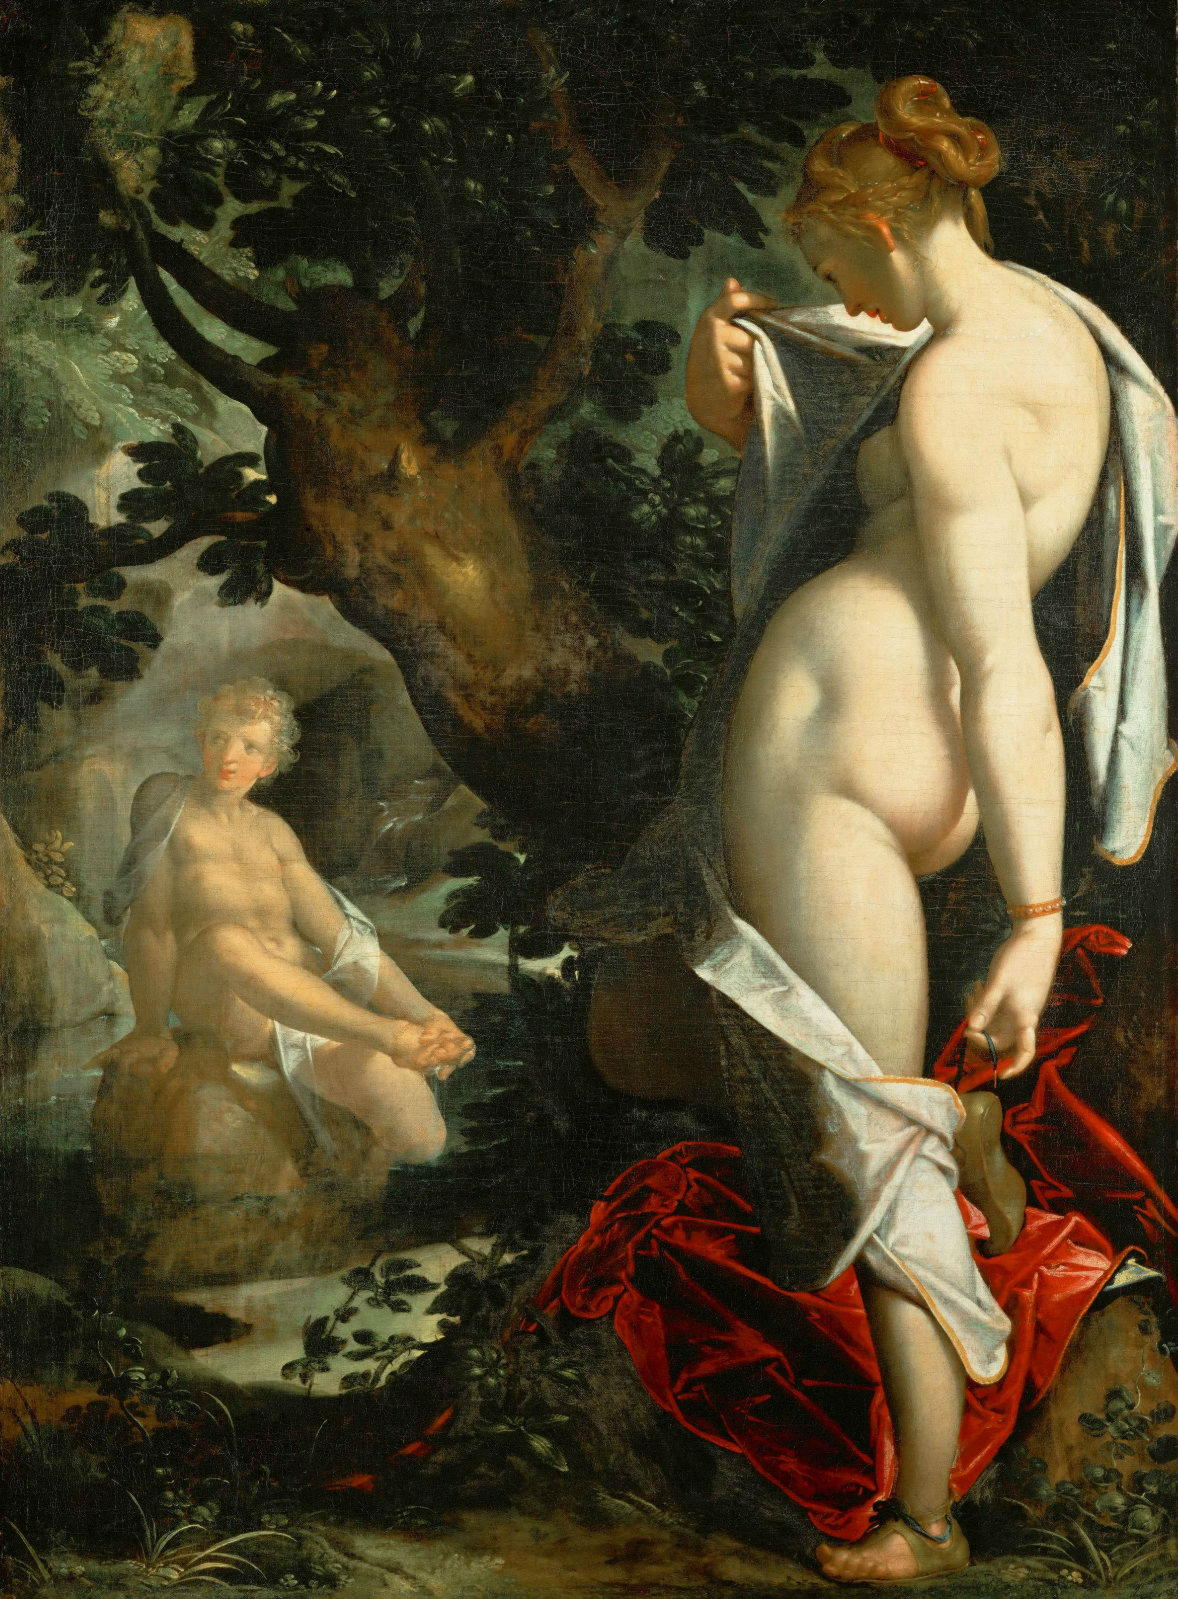 Hermaphroditos_and_Salmacis_by_Bartholomäus_Spranger